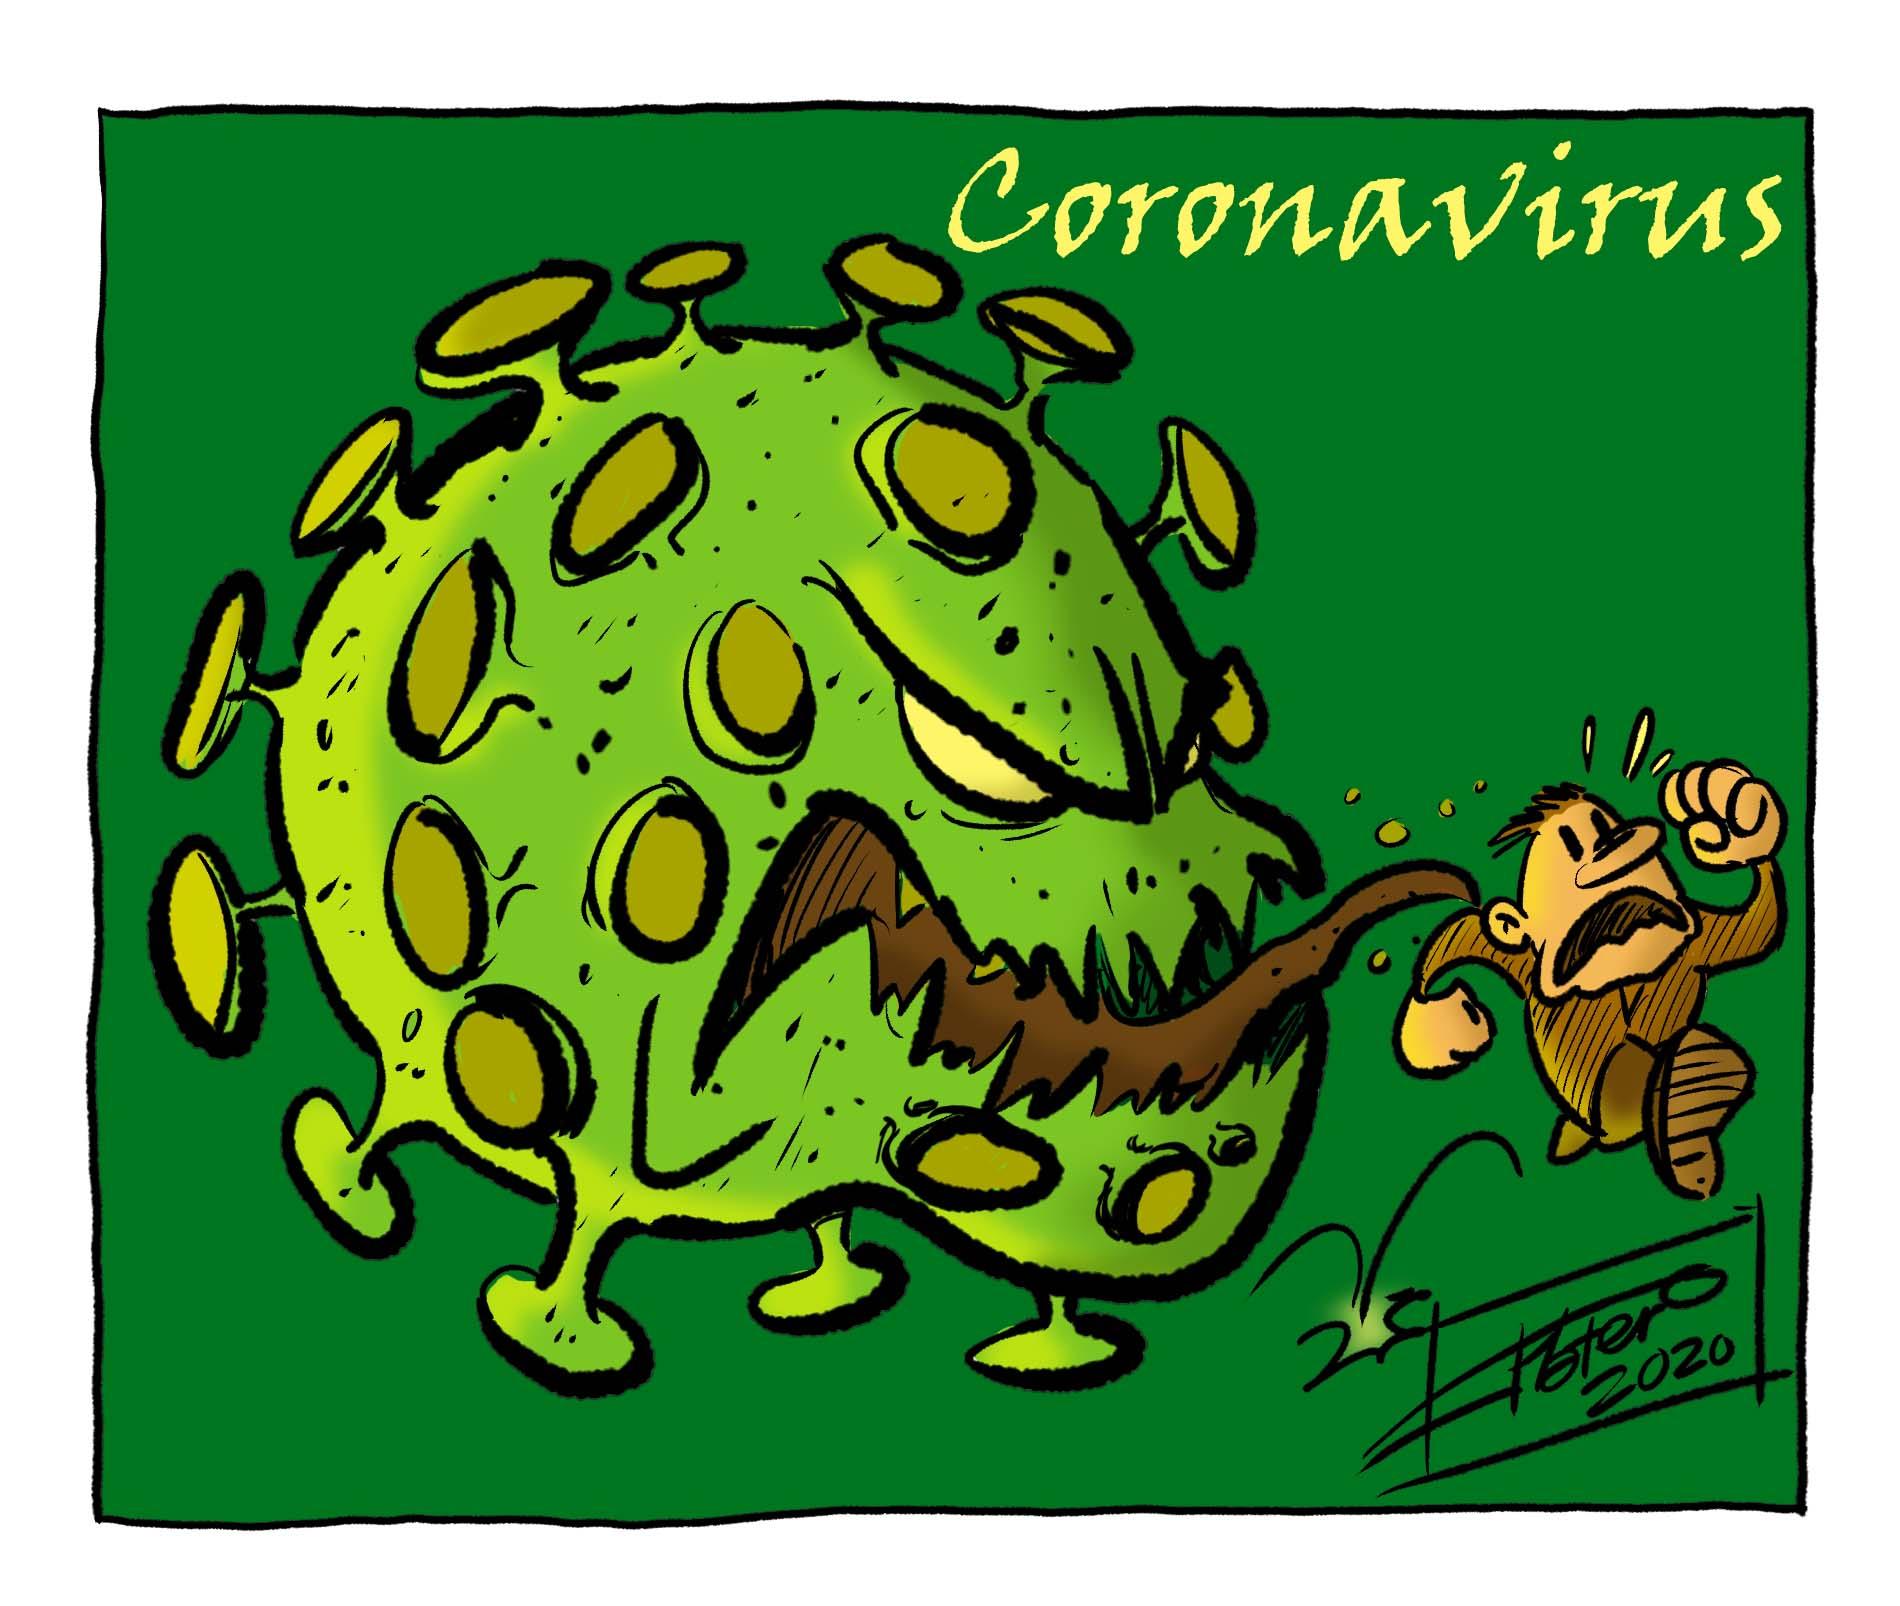 01_CORONAVIRUS_jose_luis_platero